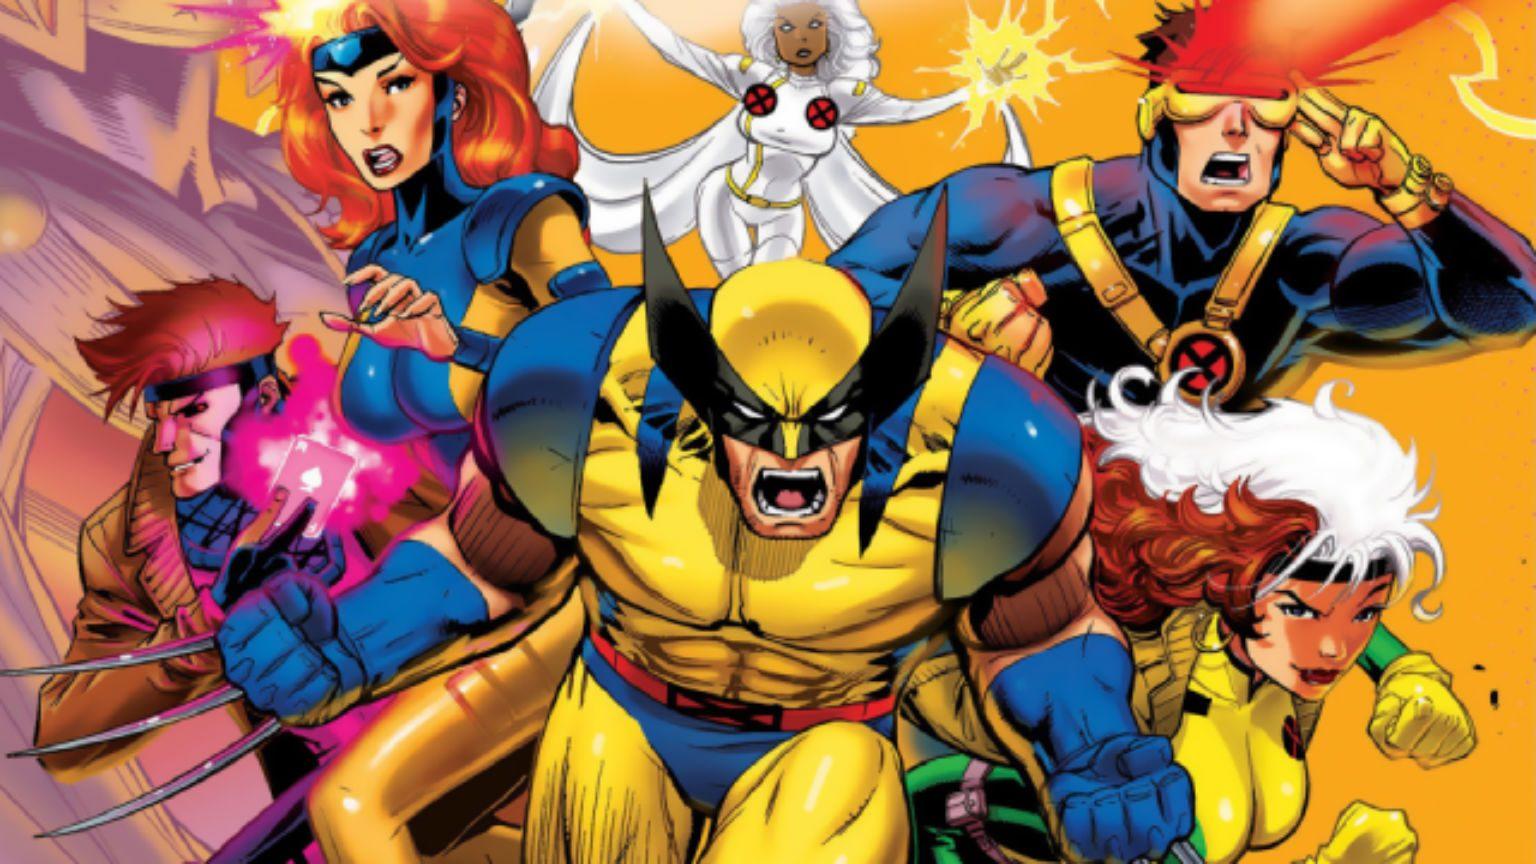 X-men animated cartoon